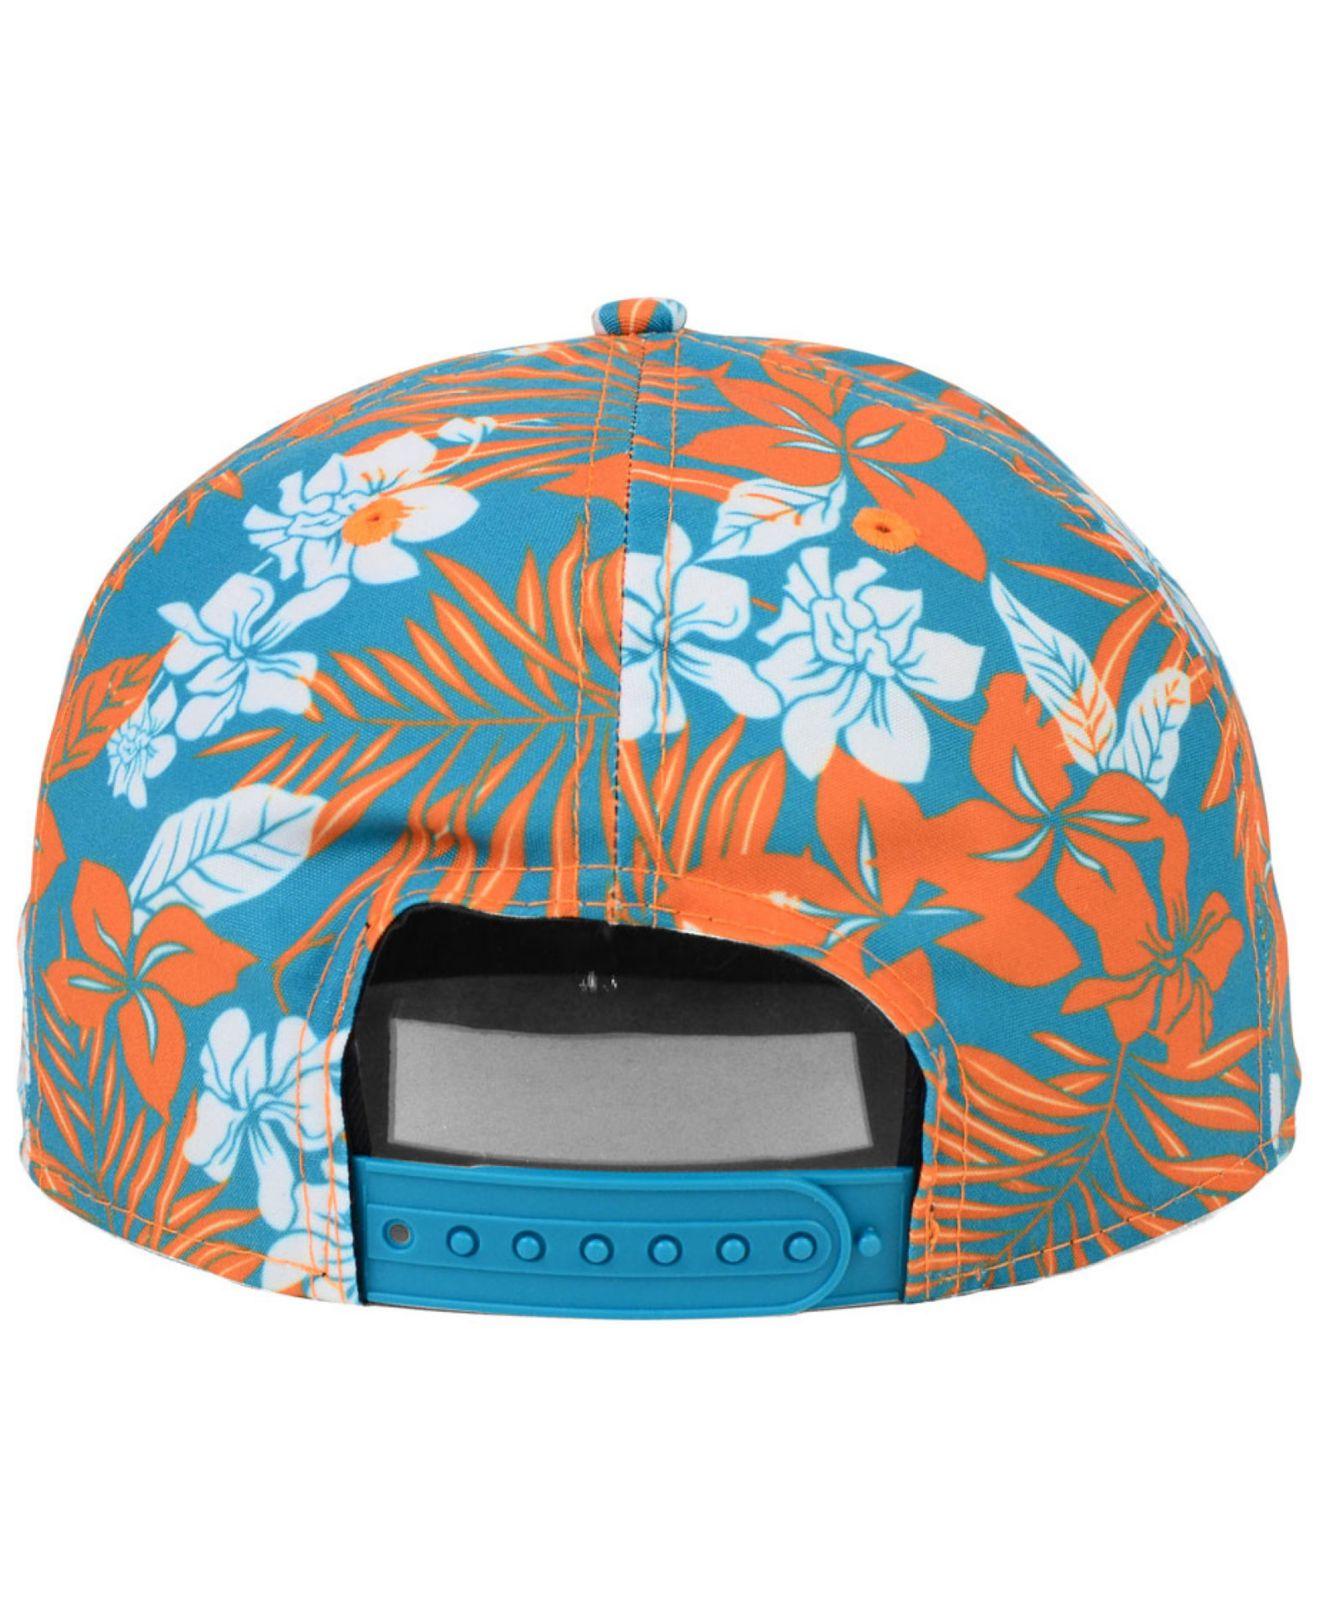 70e12793 reduced miami dolphins bucket hat new era 07 95f92 c2920